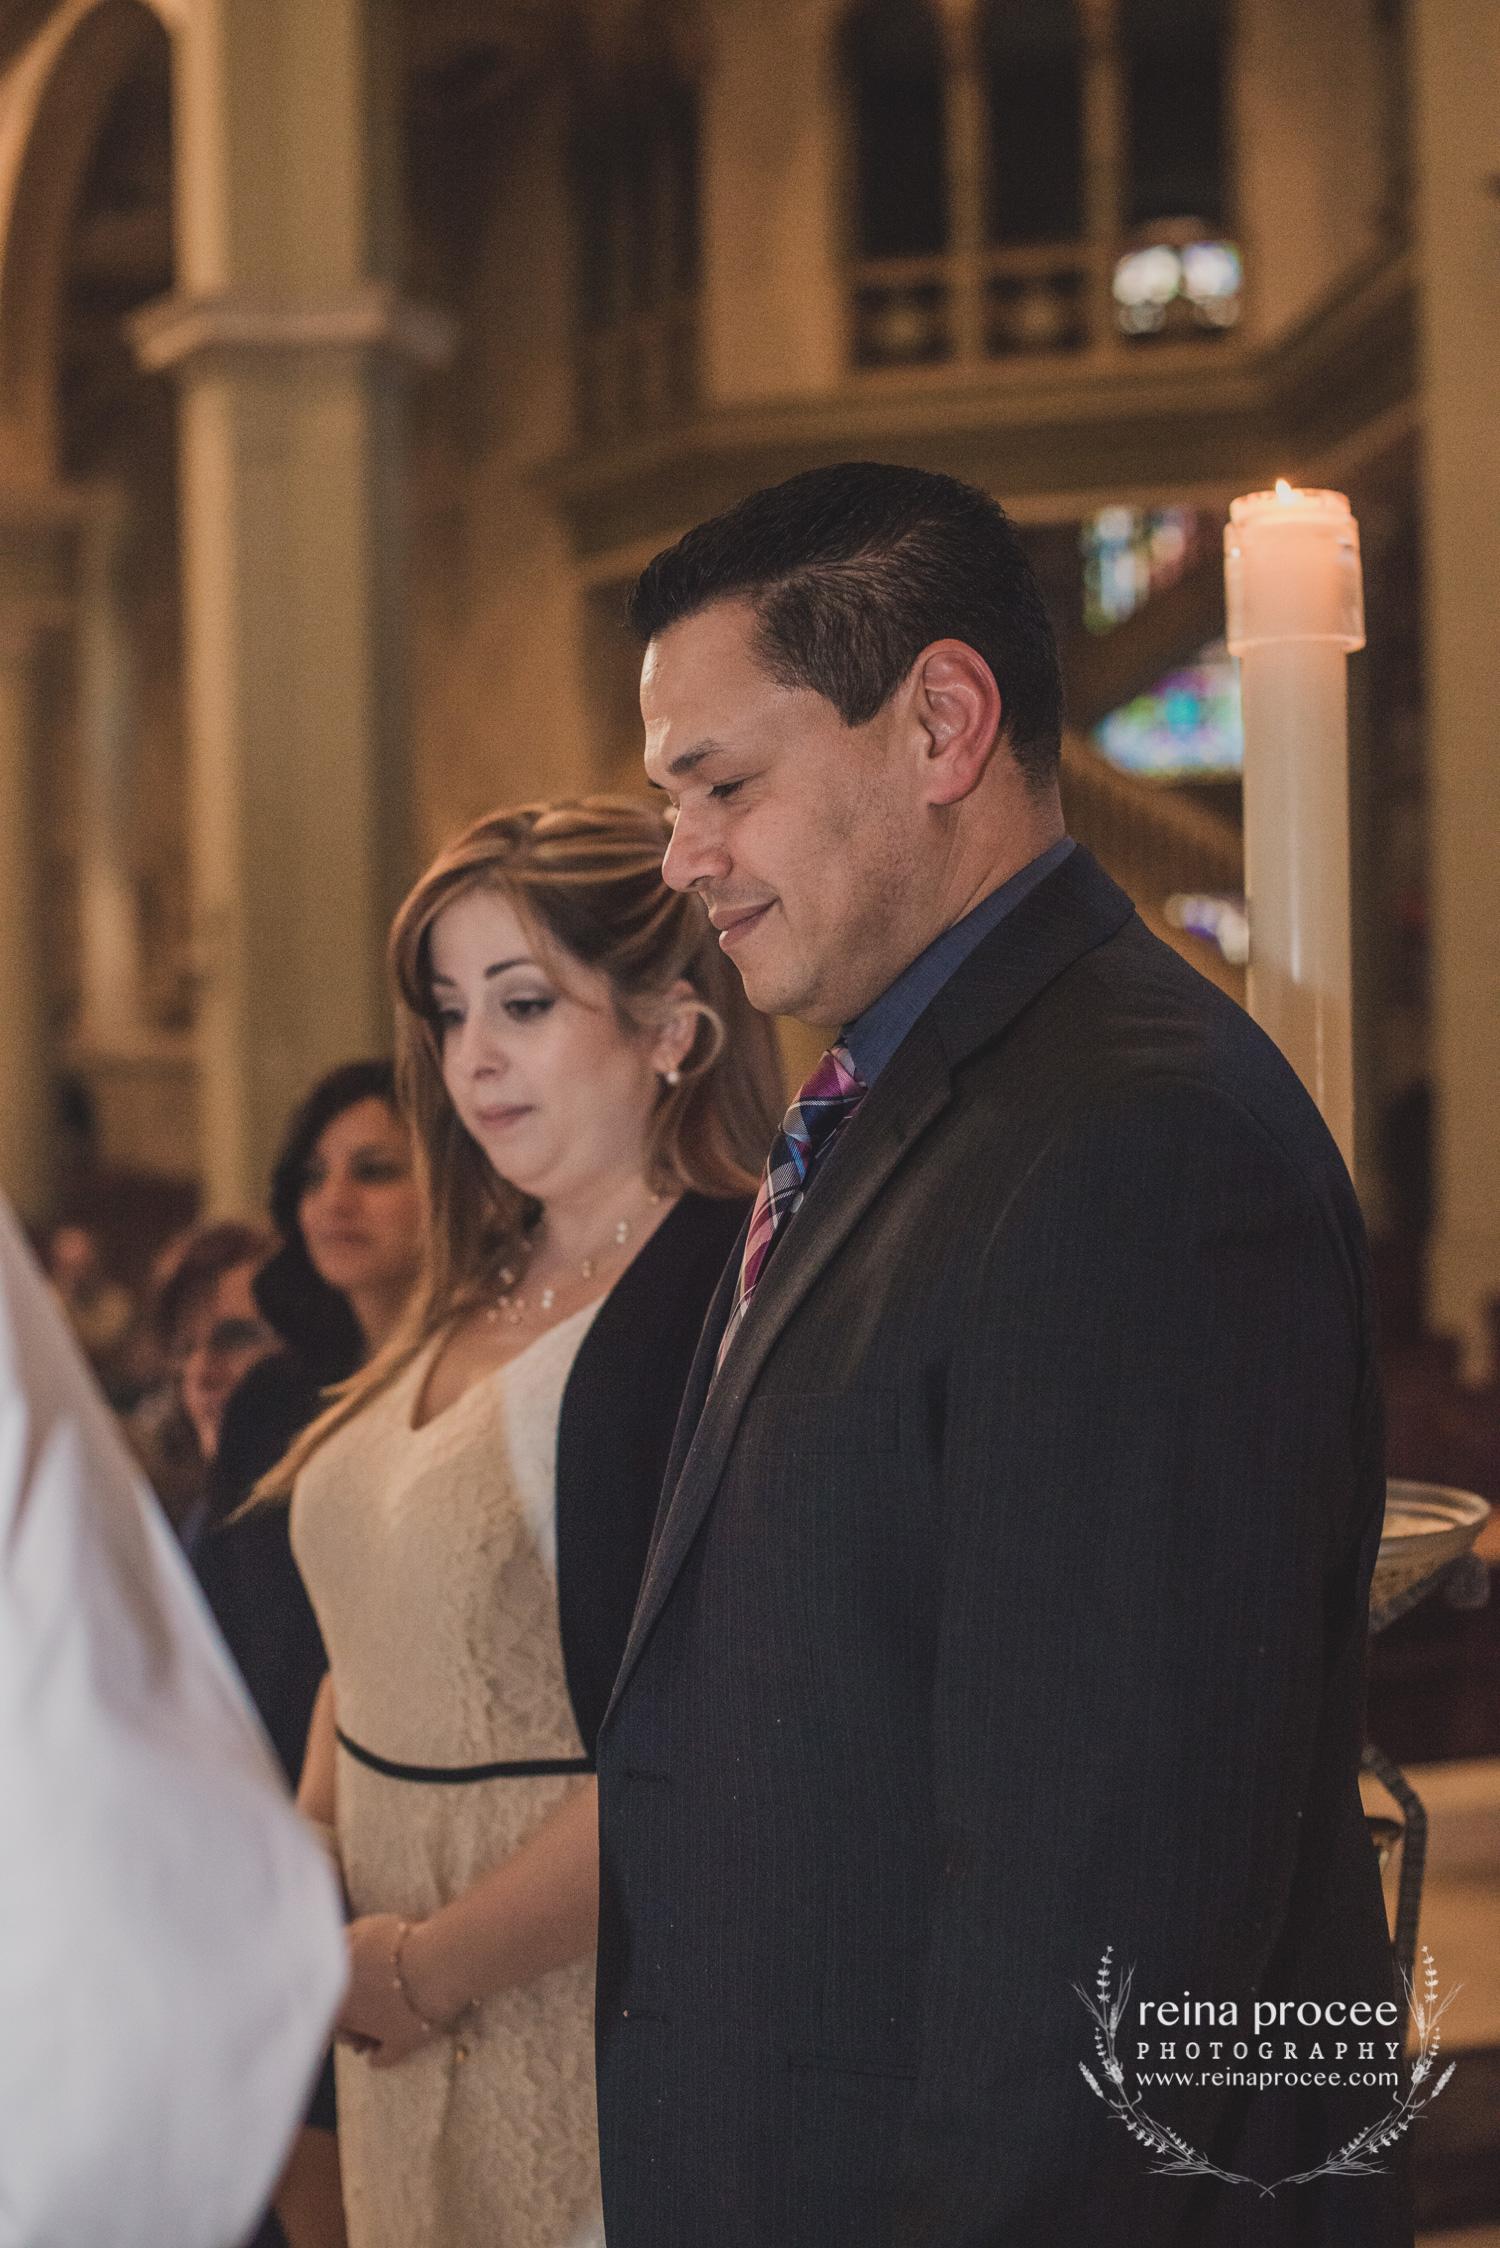 036-baptism-photographer-montreal-family-best-photos-portraits.jpg